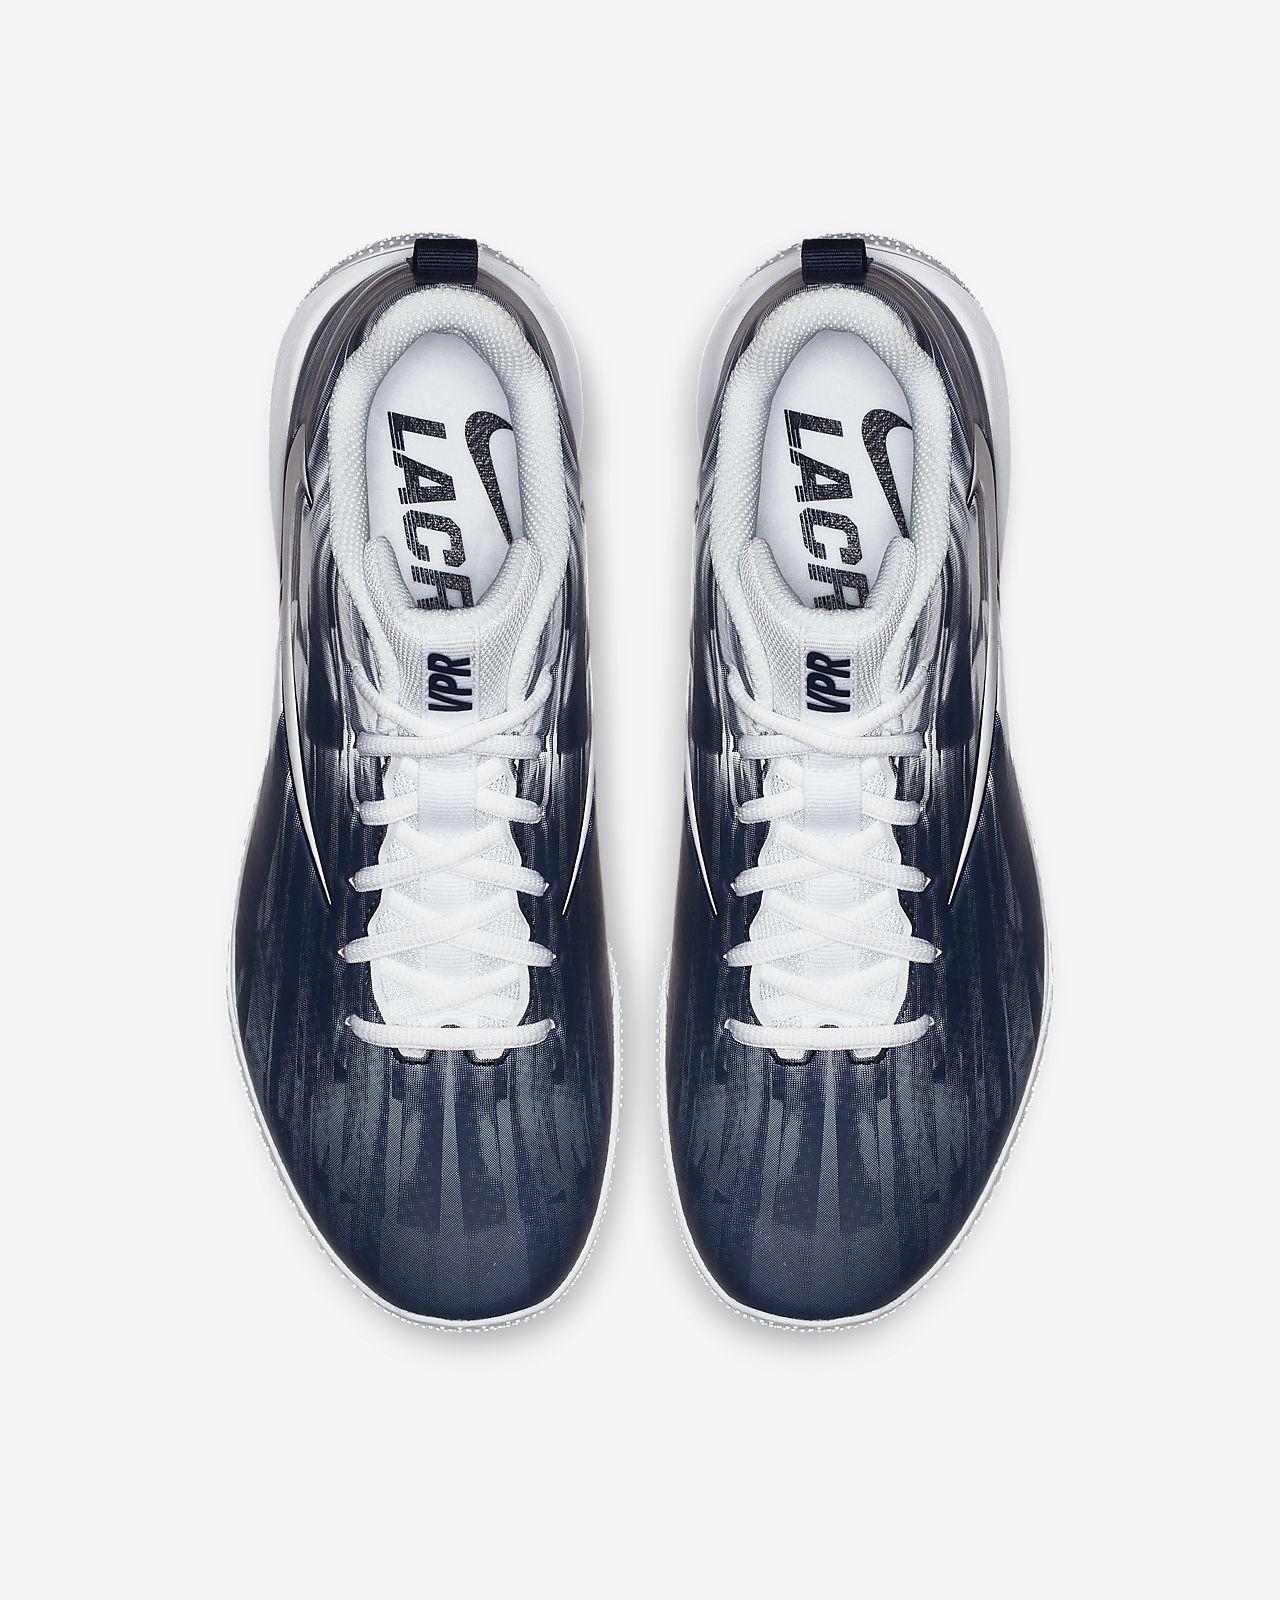 finest selection 56594 483d8 Nike Vapor Varsity Low Turf LAX Lacrosse Shoe